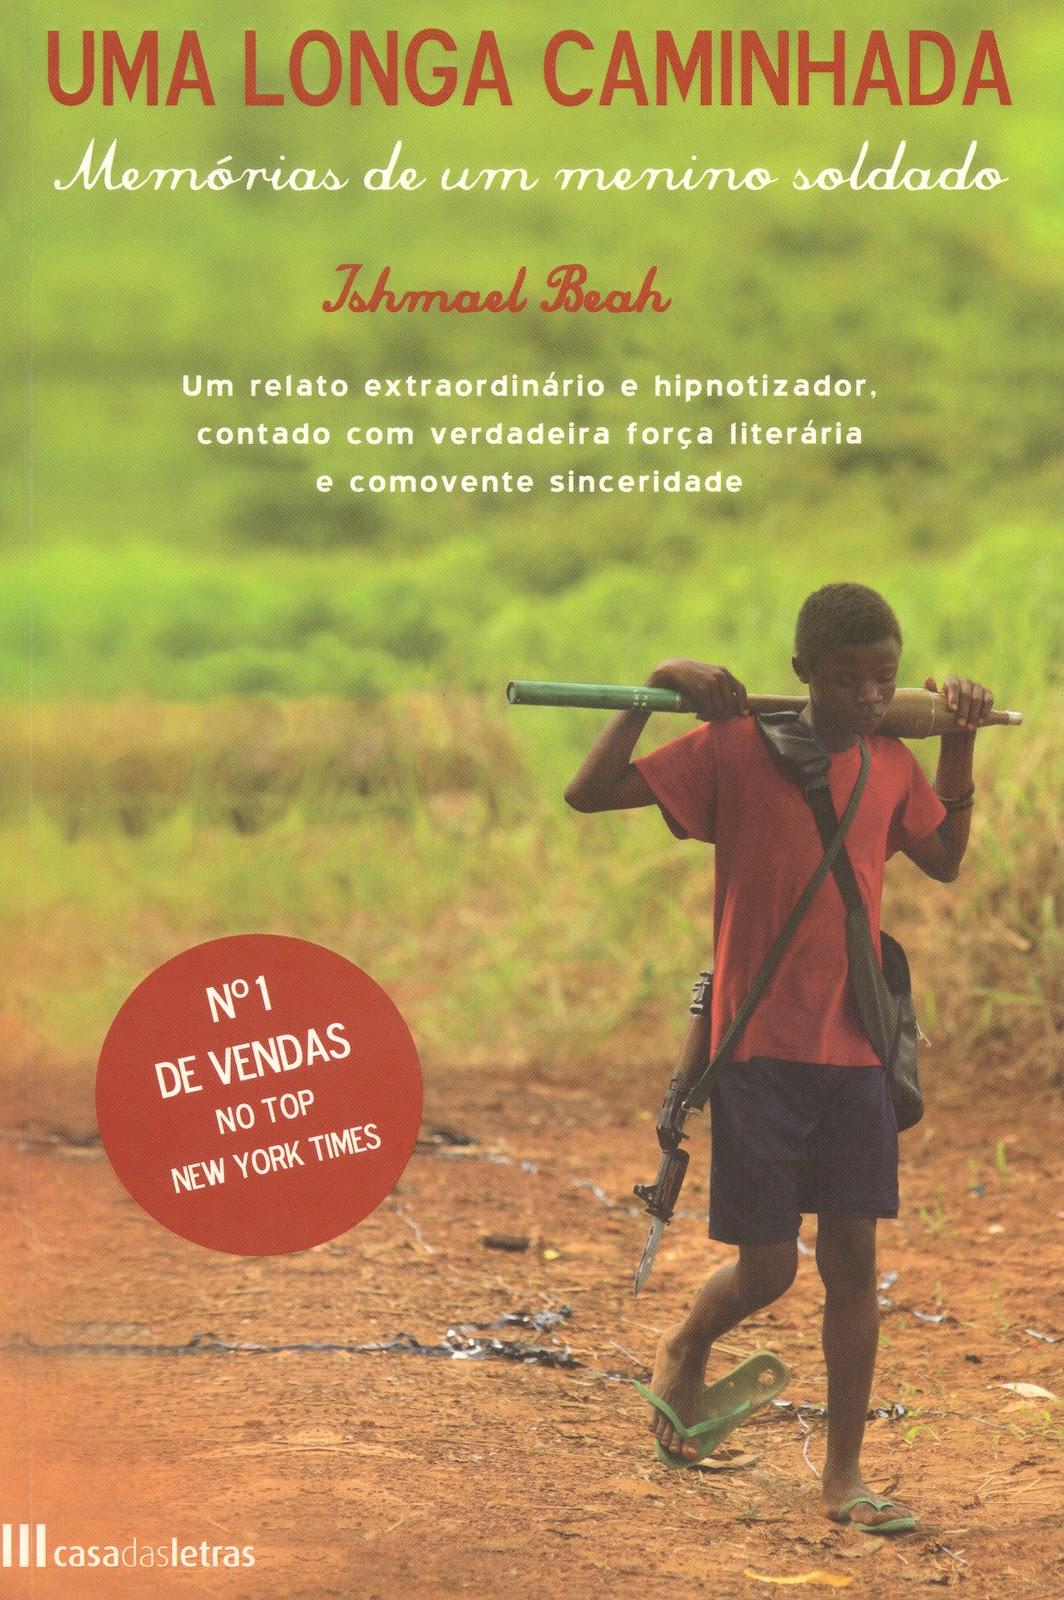 http://4.bp.blogspot.com/-qnGq2FWRxE8/TvxmEf9eLII/AAAAAAAAC8k/IUvs3SQXSYY/s1600/A+Longa+Caminhada.bmp